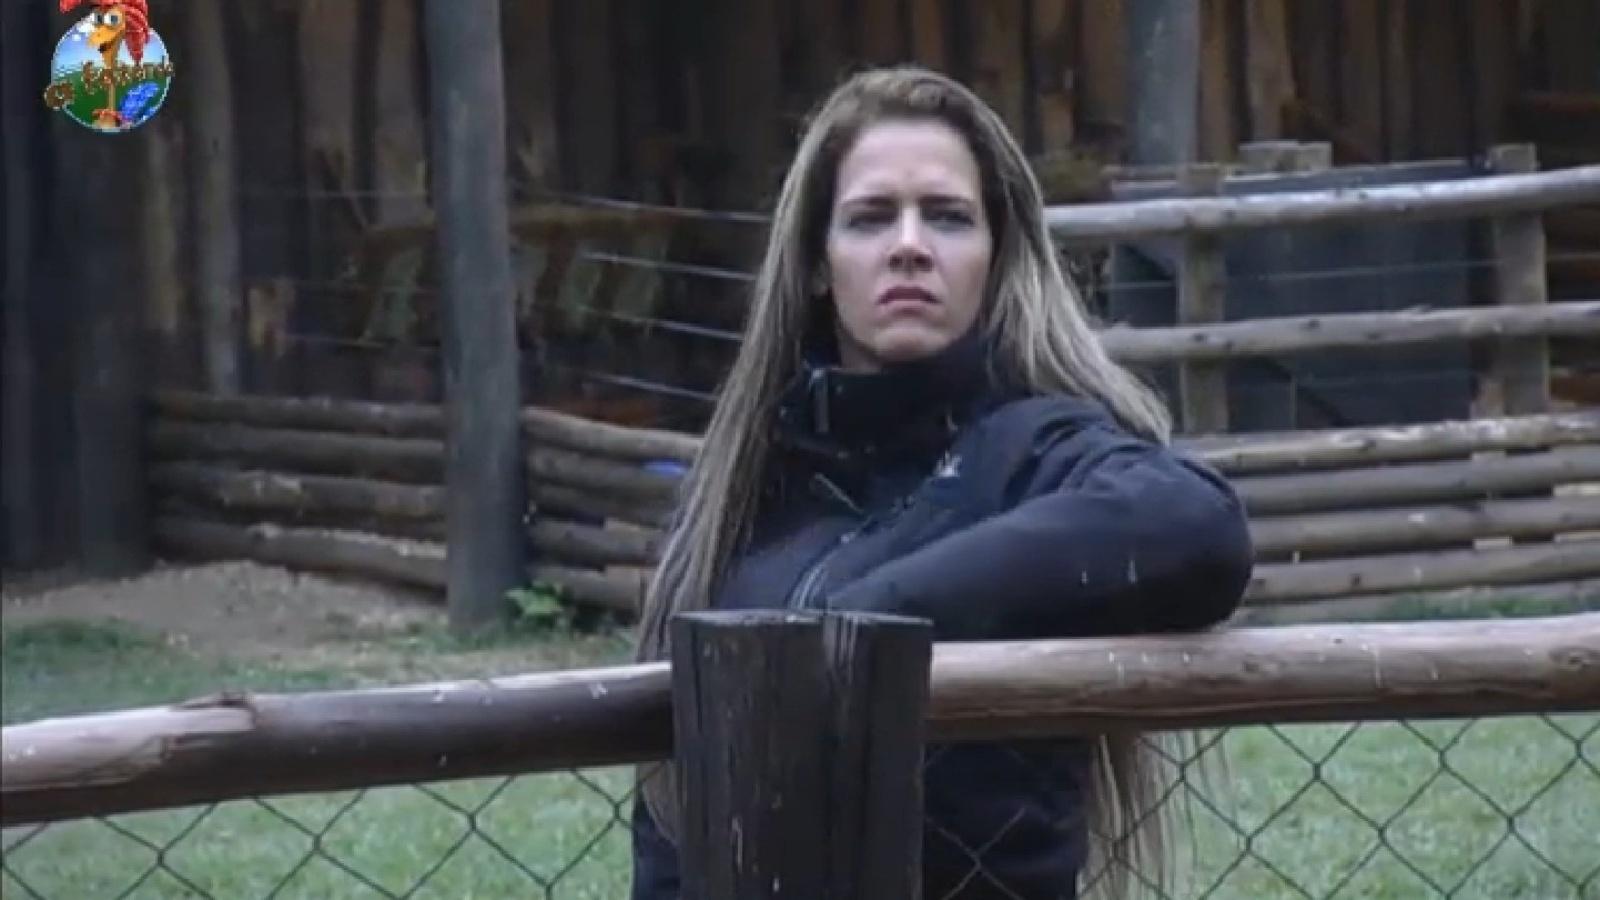 15.ago.2013 - Após noite conturbada, Denise Rocha observa os animais na manhã desta quinta-feira